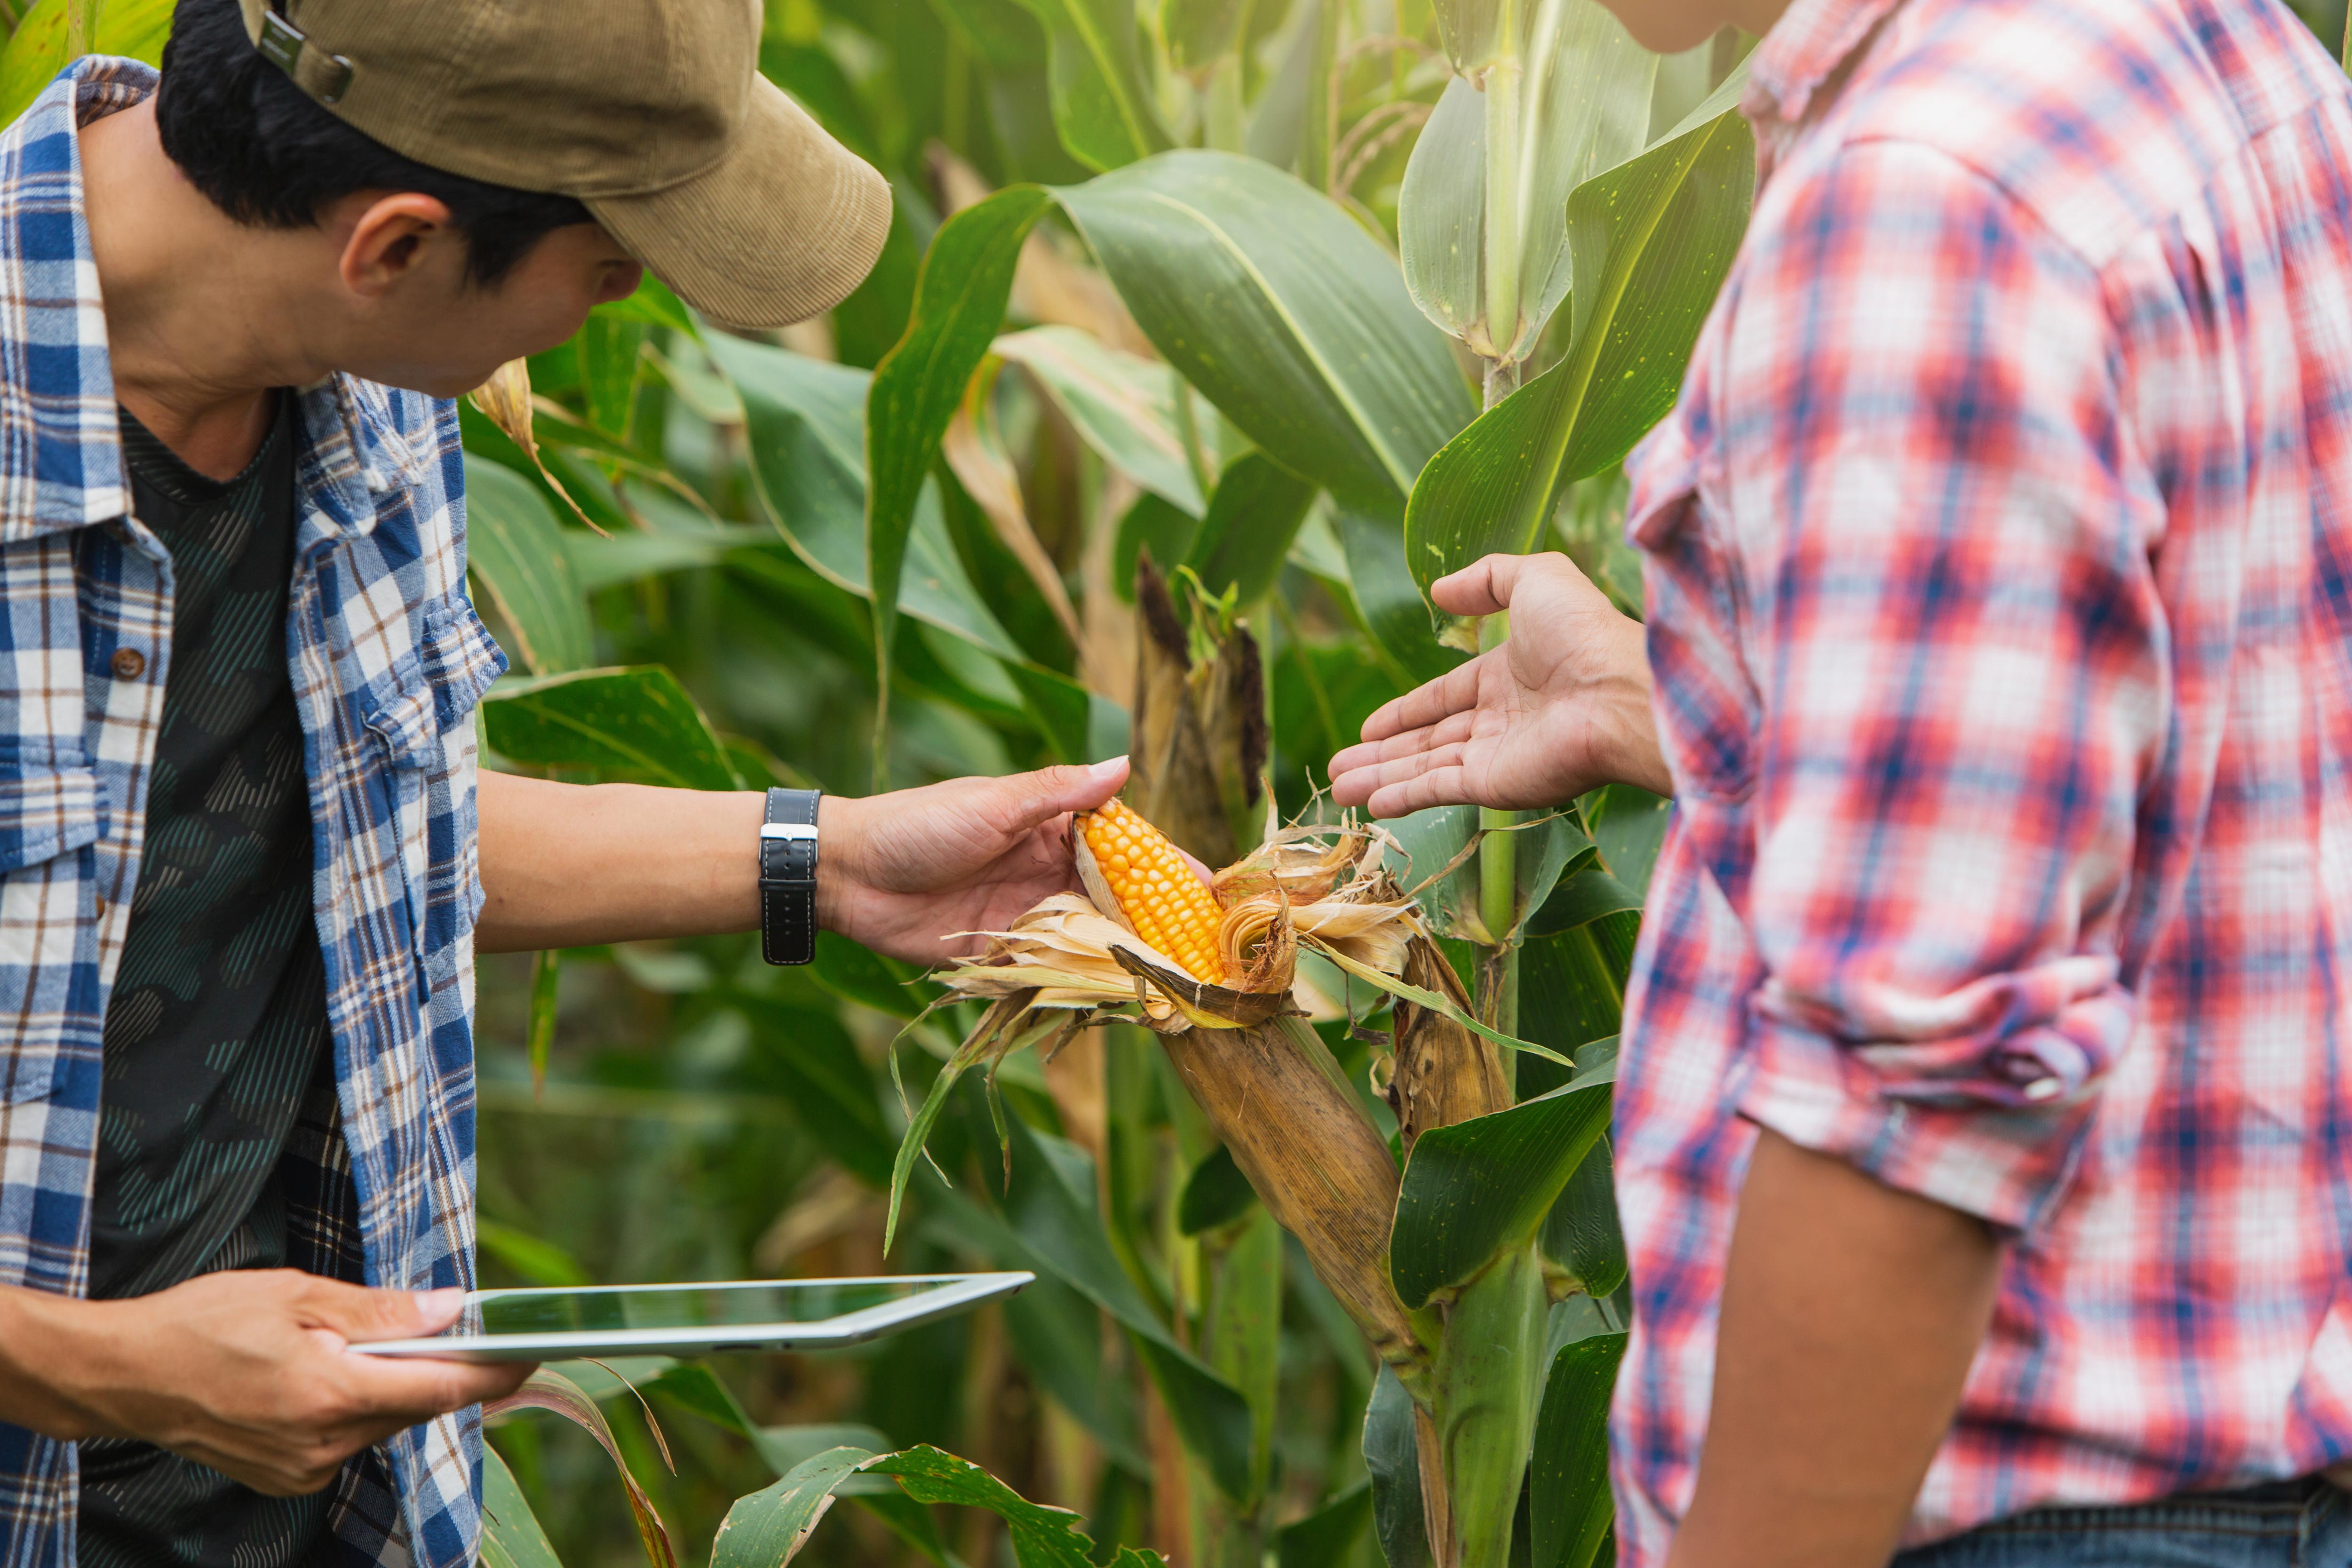 scouts observ corn